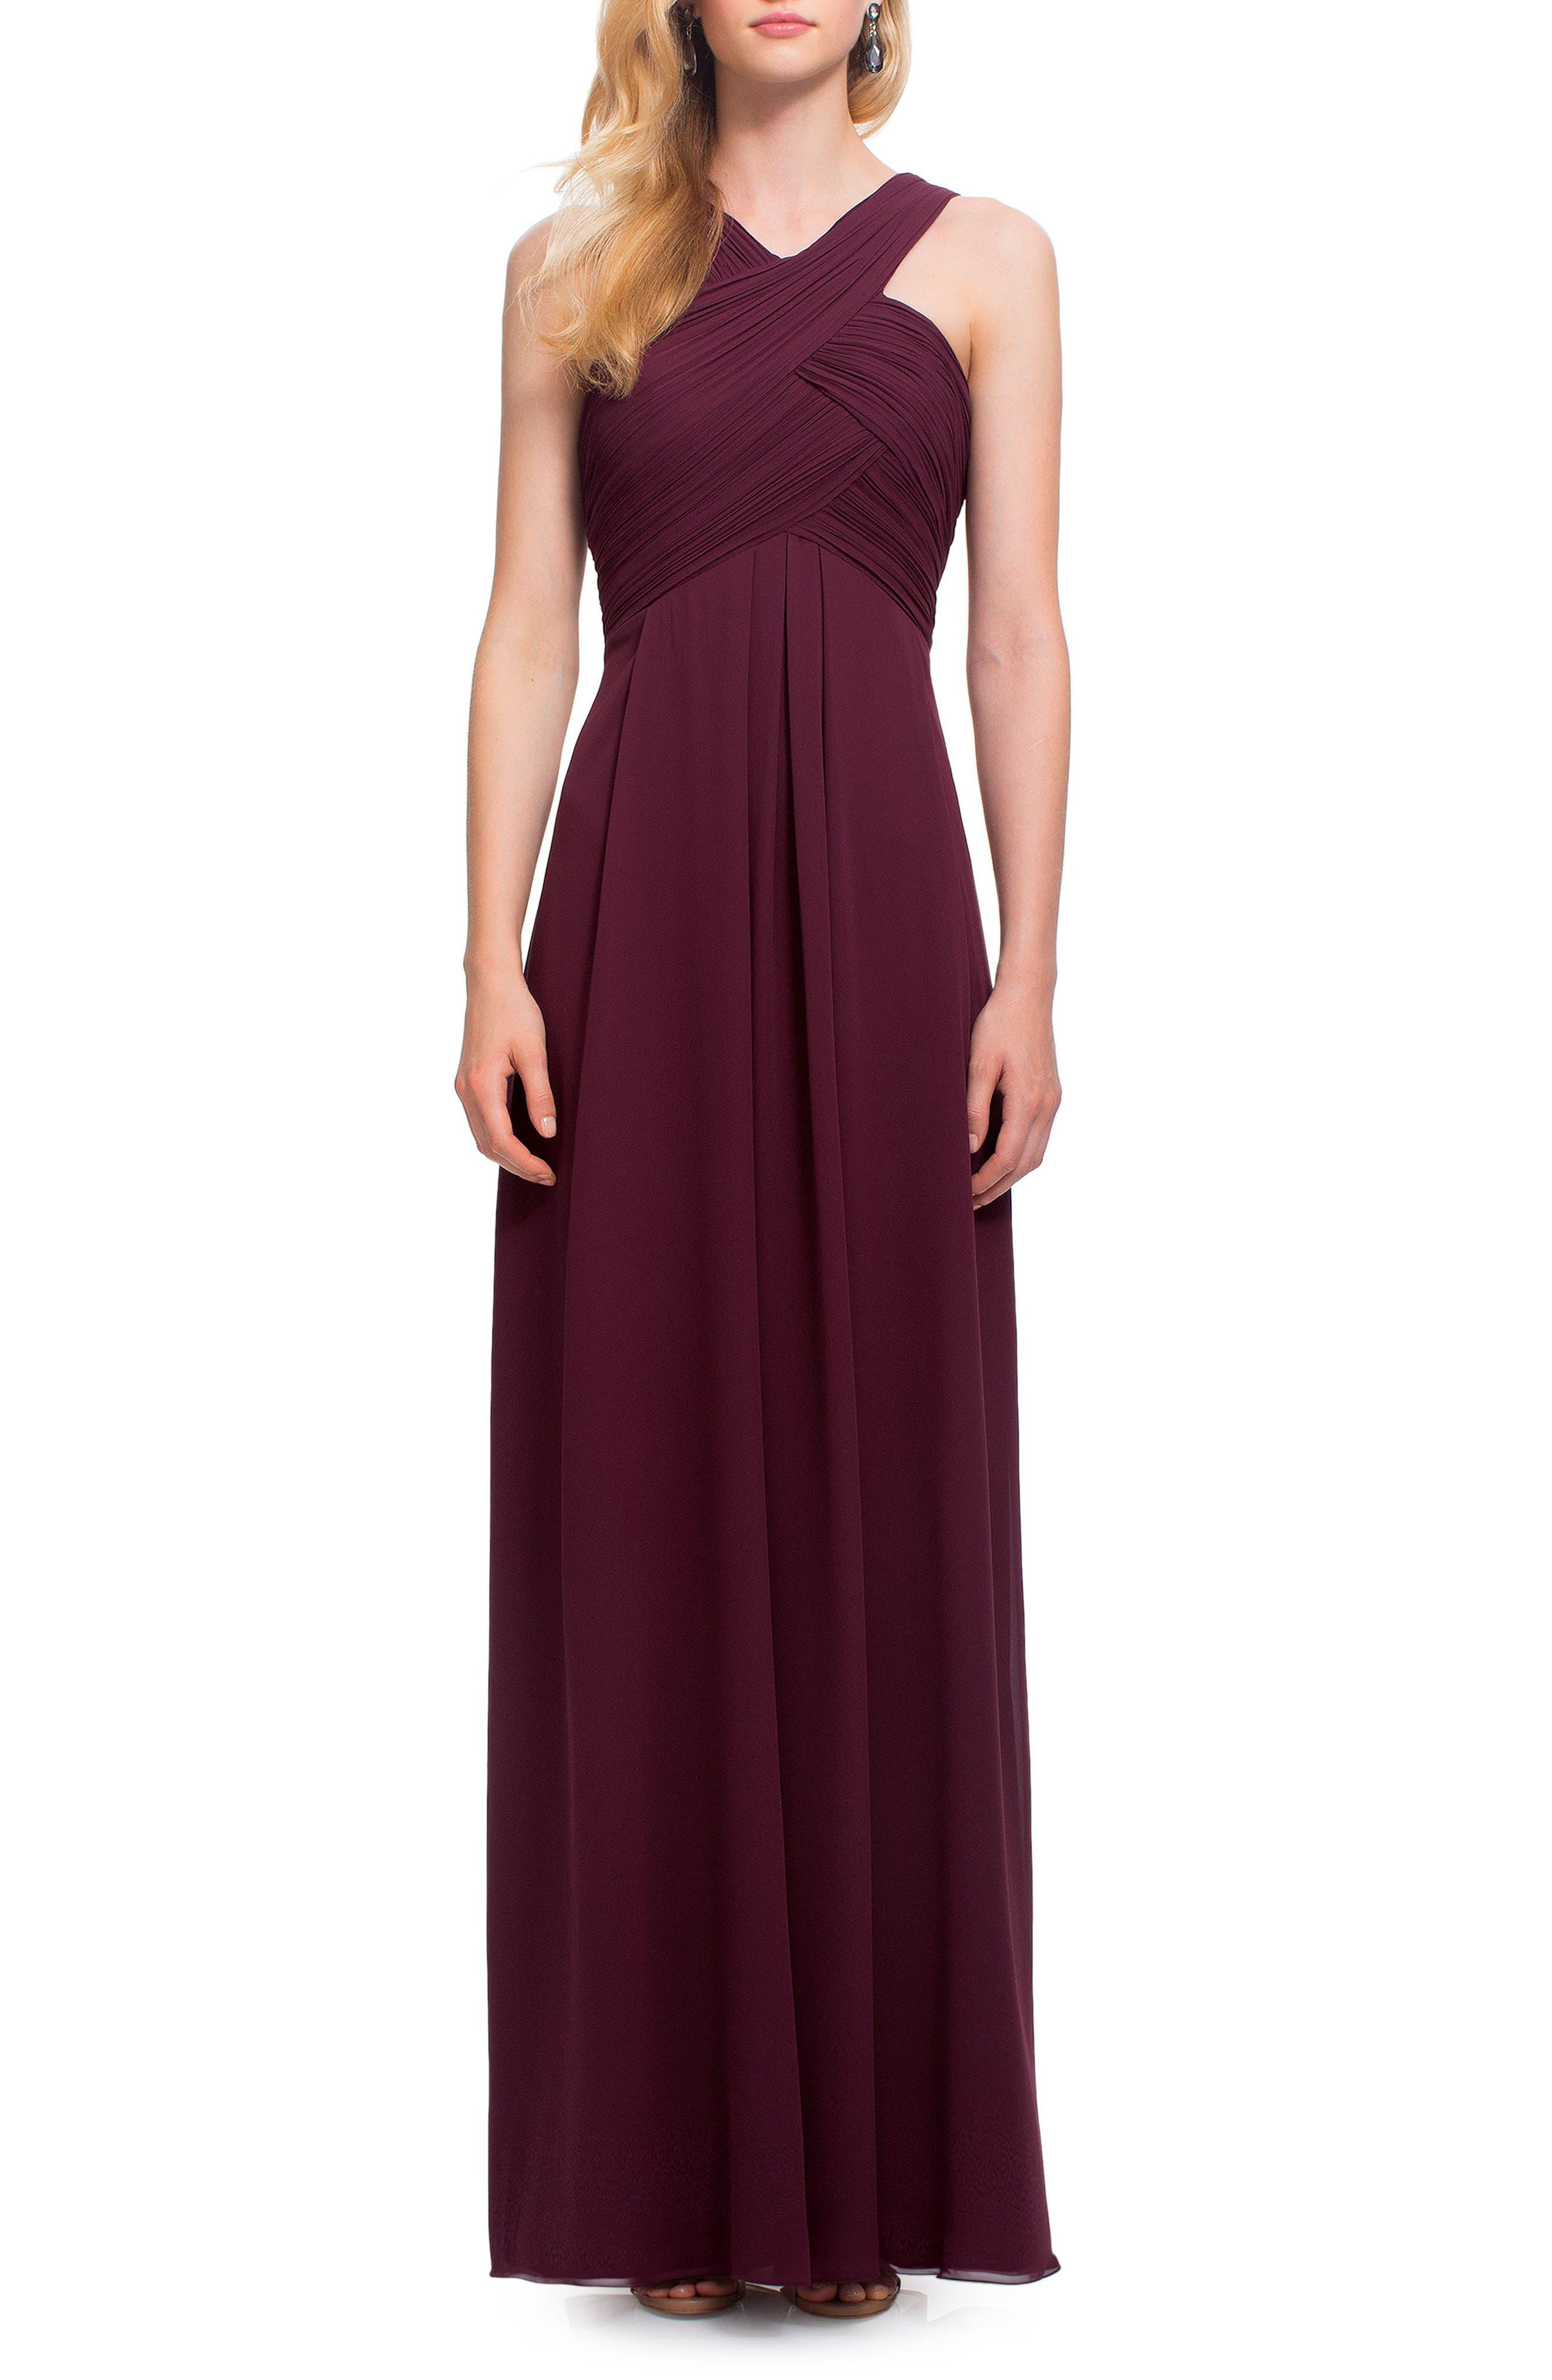 #levkoff Crisscross Bodice Chiffon Gown, Burgundy